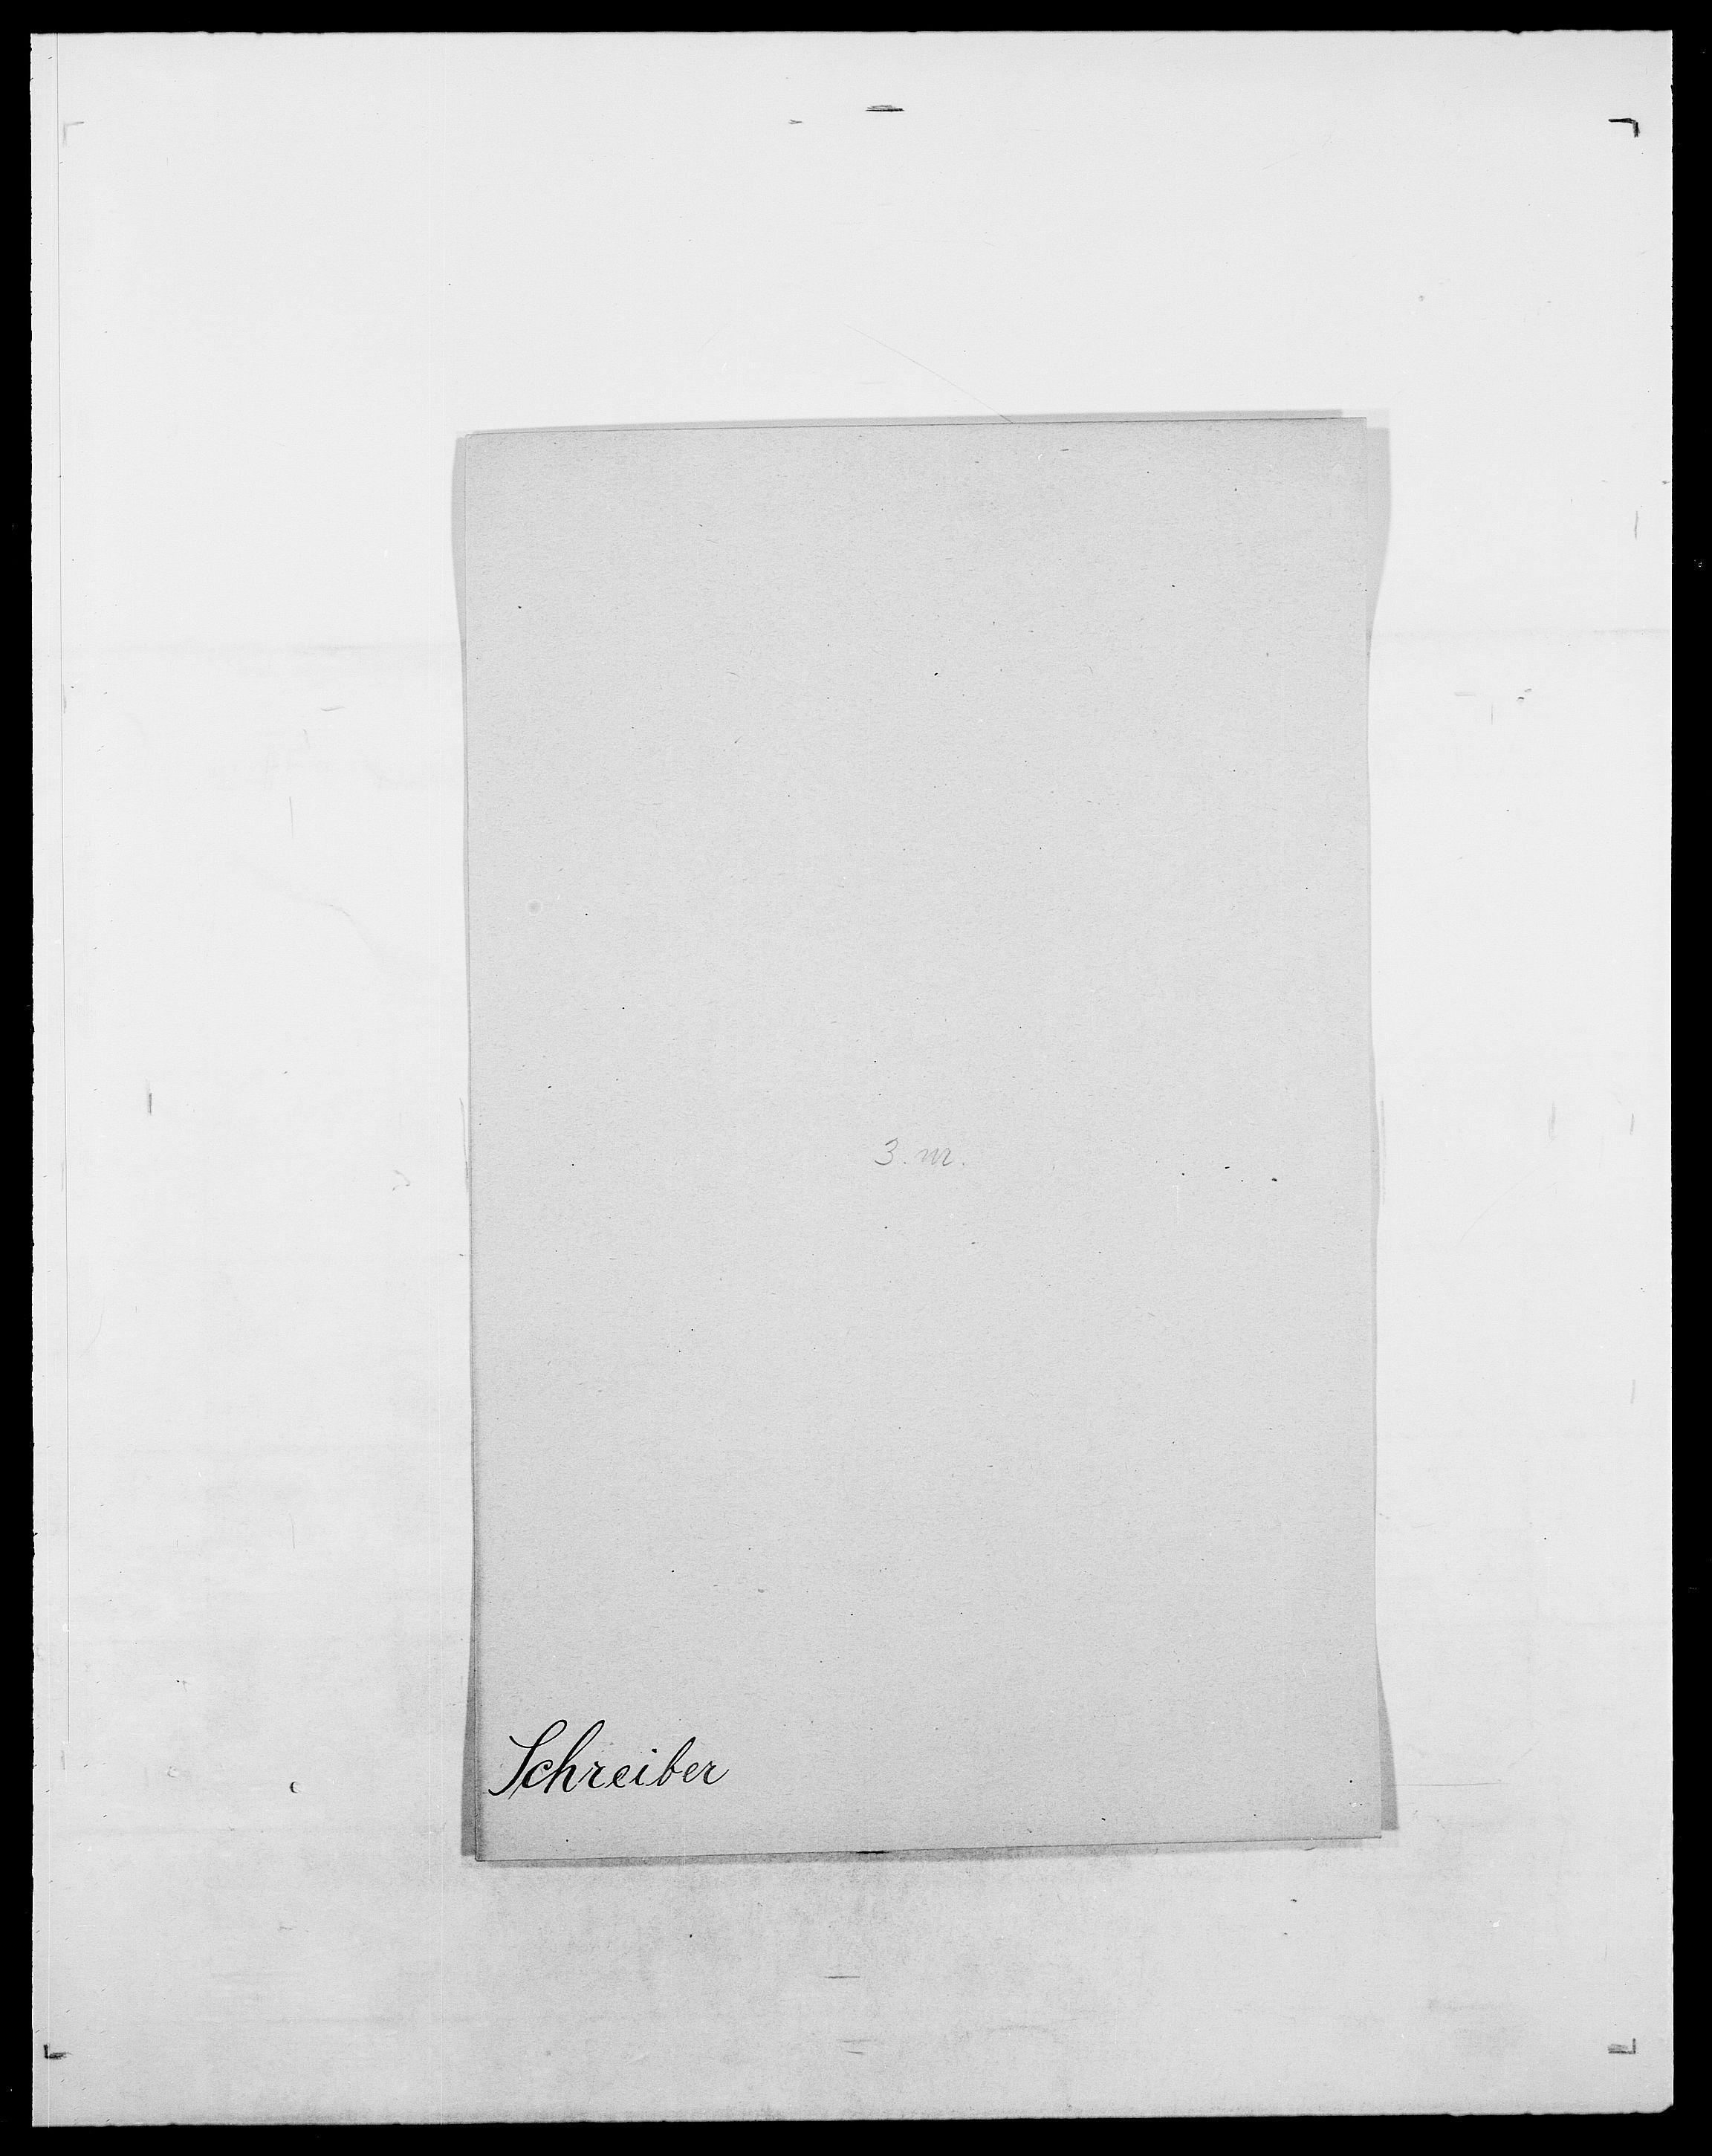 SAO, Delgobe, Charles Antoine - samling, D/Da/L0035: Schnabel - sjetman, s. 142